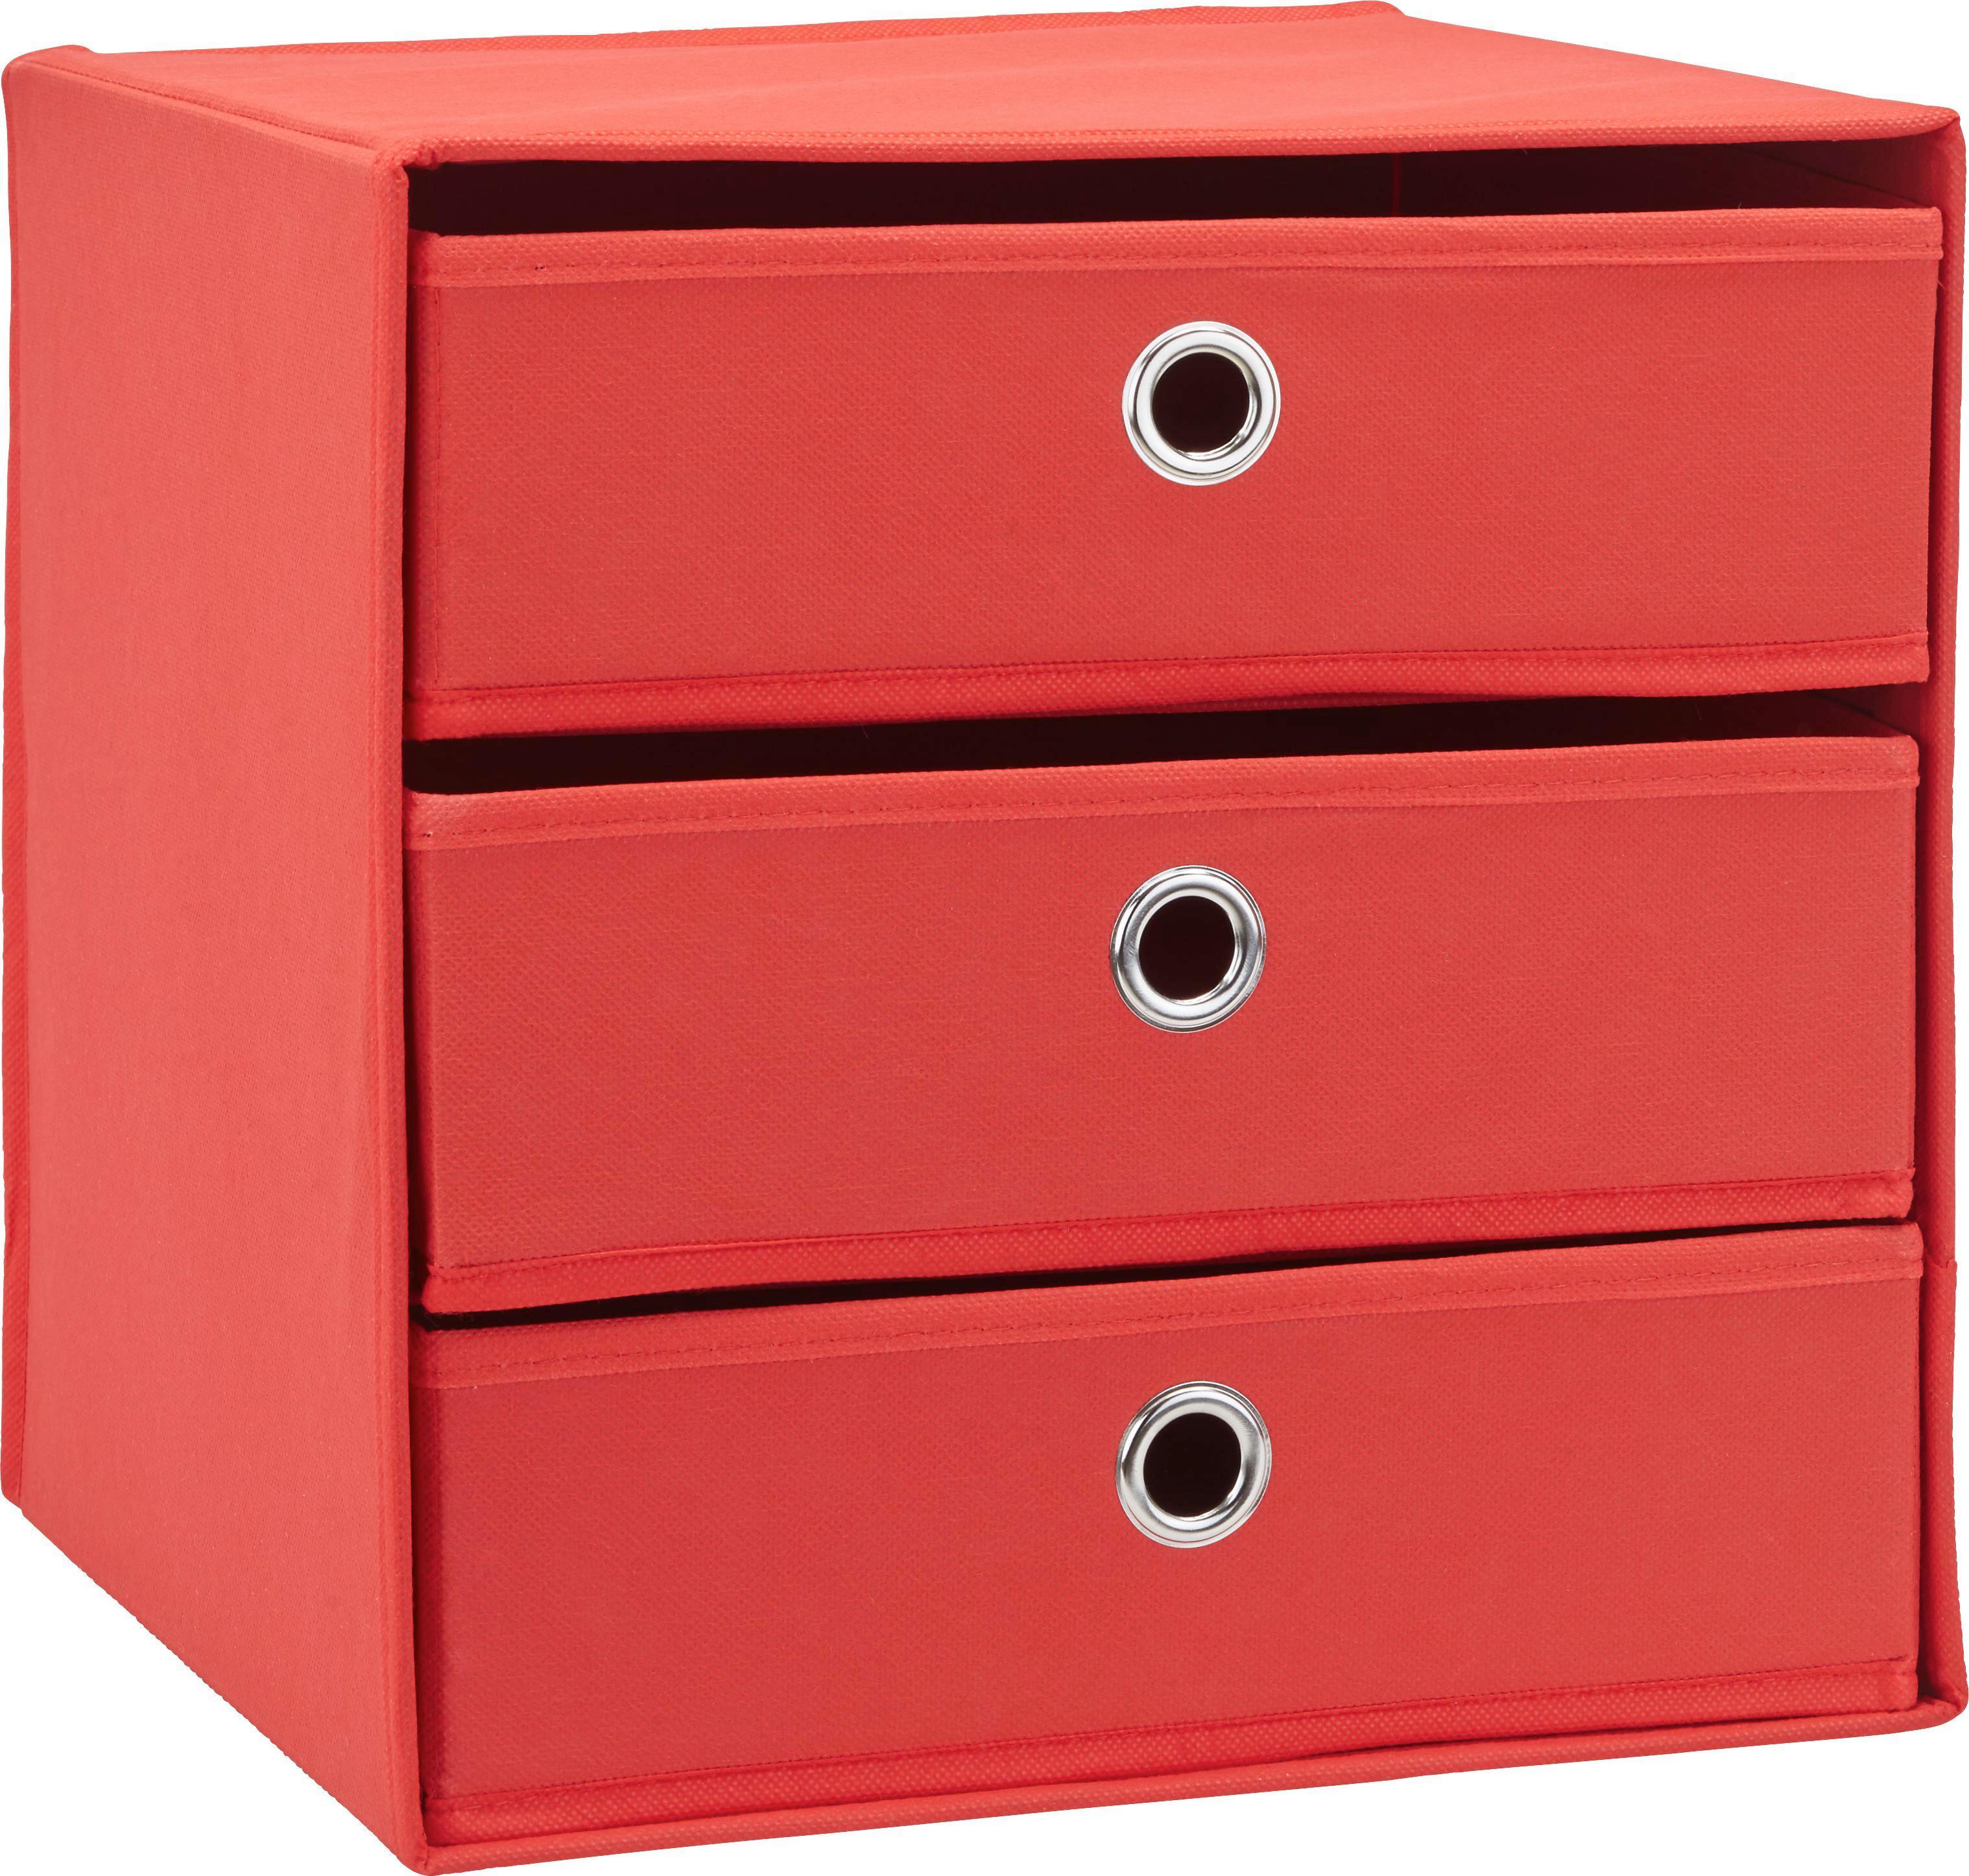 Schubladenbox Mona in Rot ca. 32x31,5cm - Rot, MODERN, Karton/Textil (32/31,5/32cm) - MÖMAX modern living